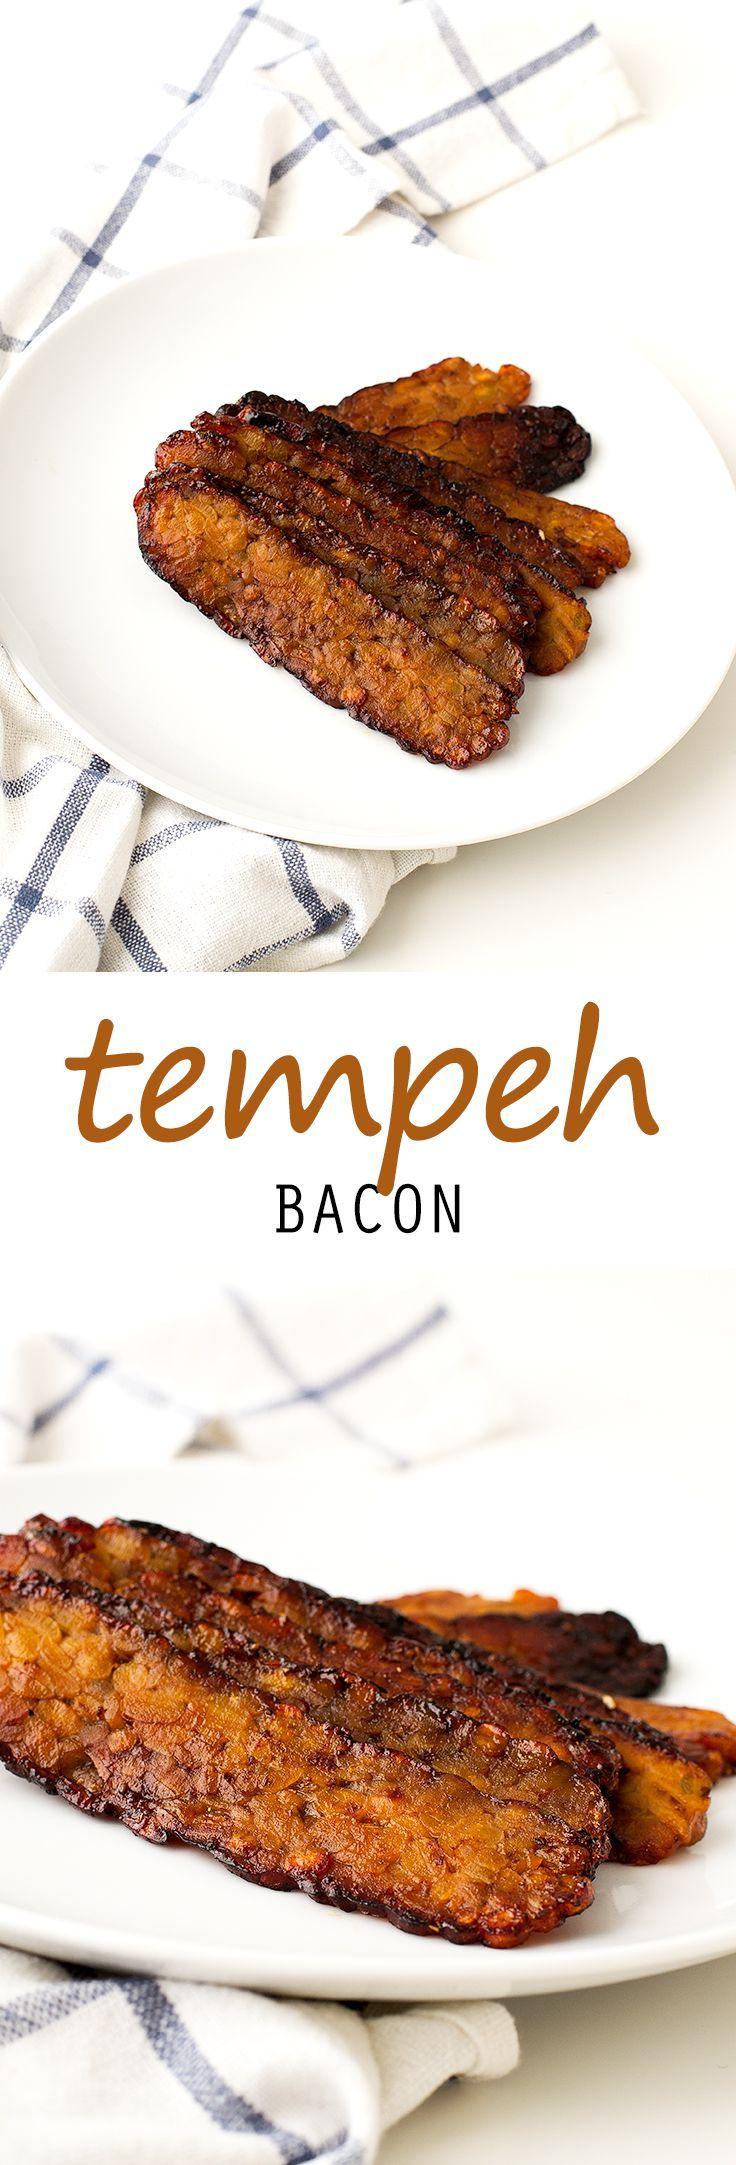 107 best vegan recipes: tempeh images on Pinterest | Vegan recipes ...